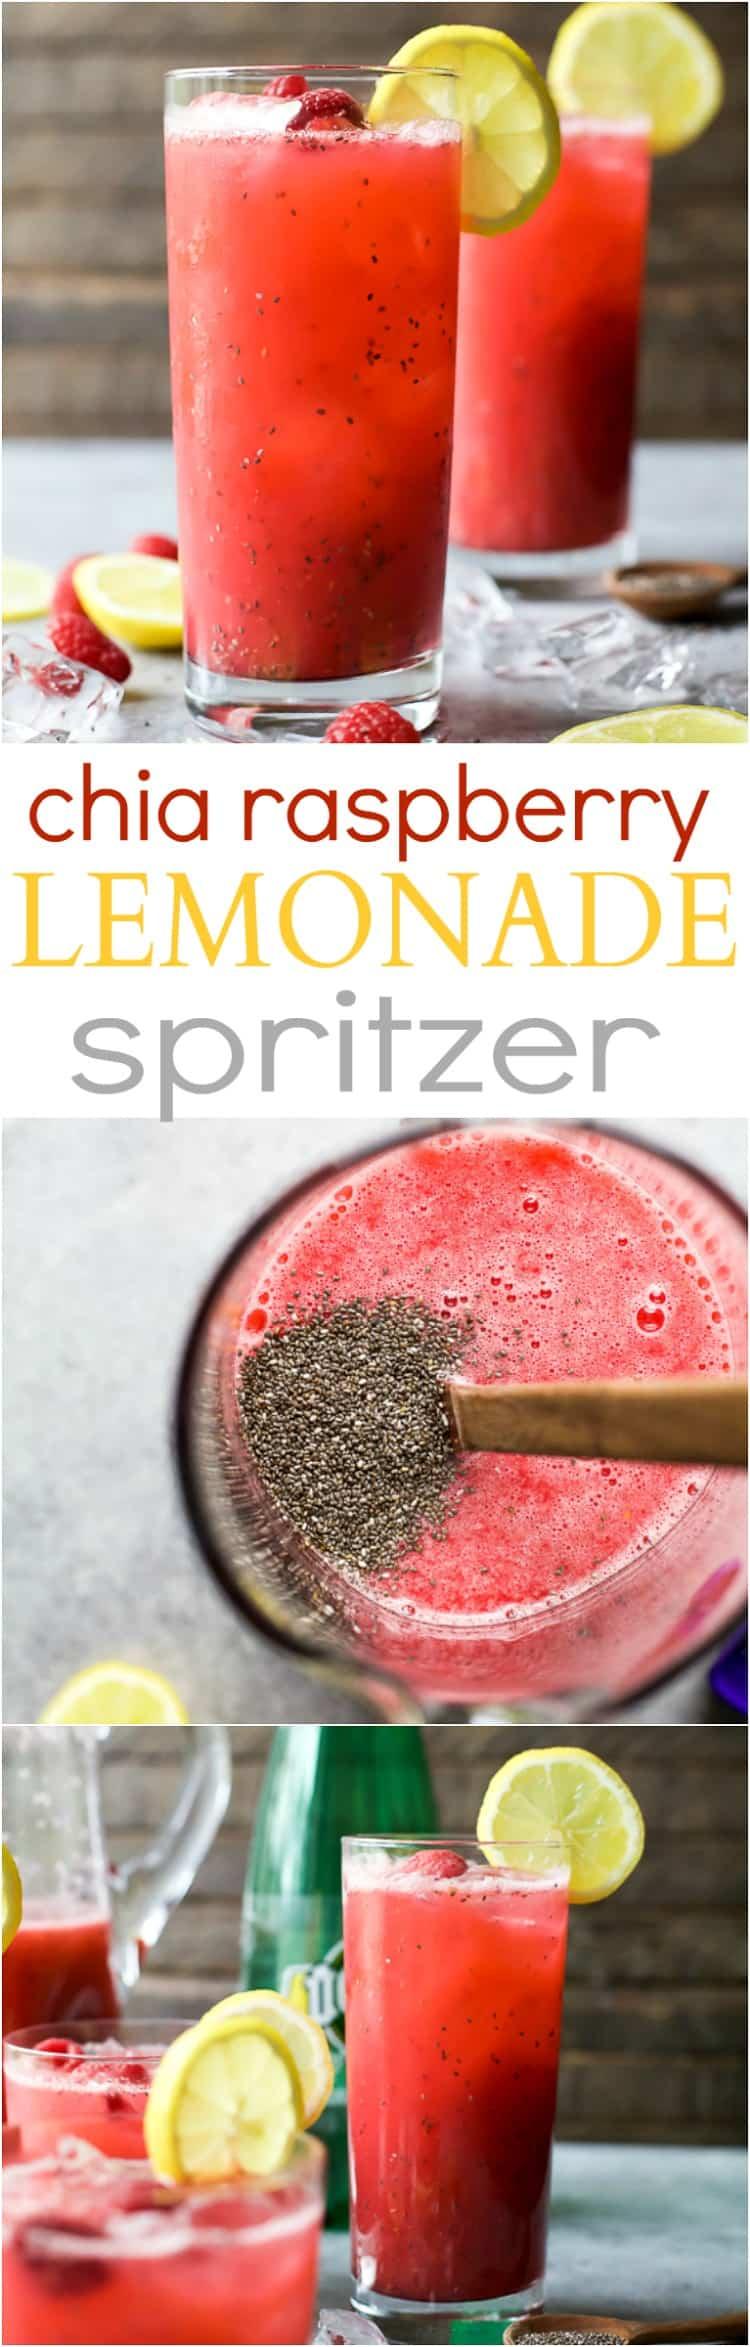 Pinterest collage for Chia Raspberry Lemonade Spritzer recipe